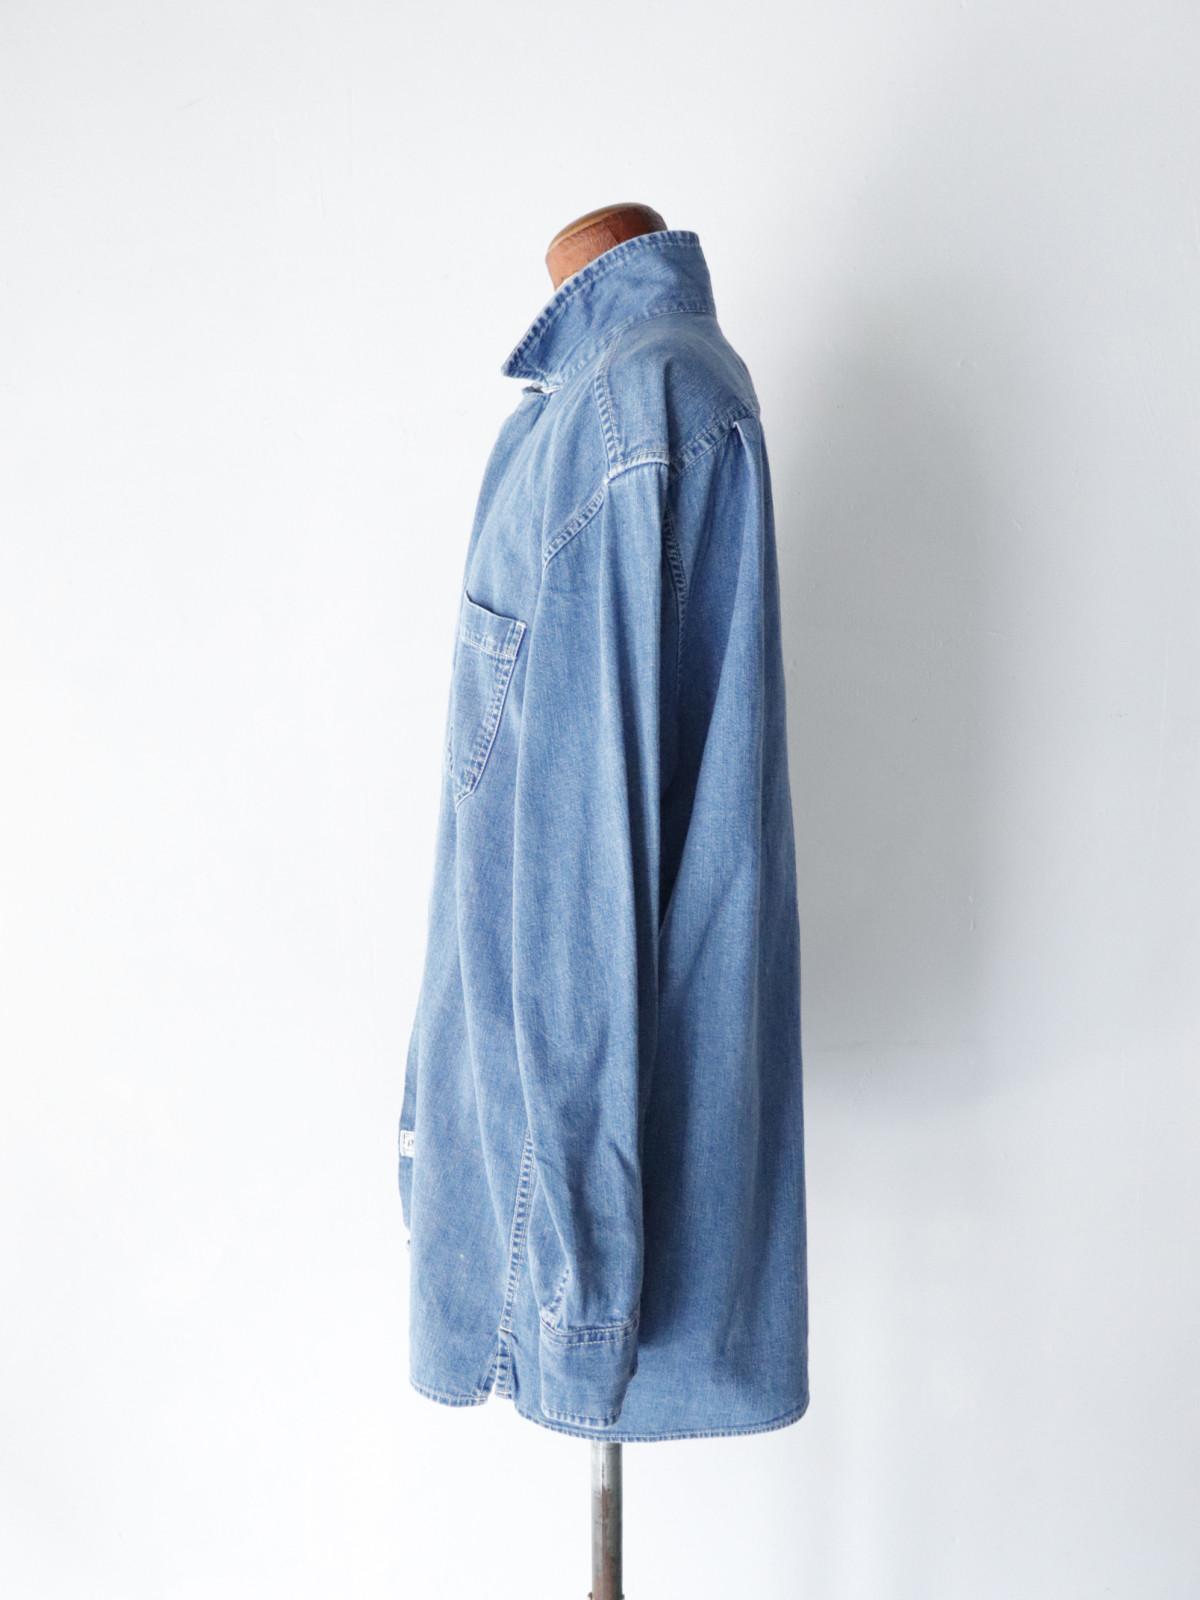 DKNY, denim jacket, USA